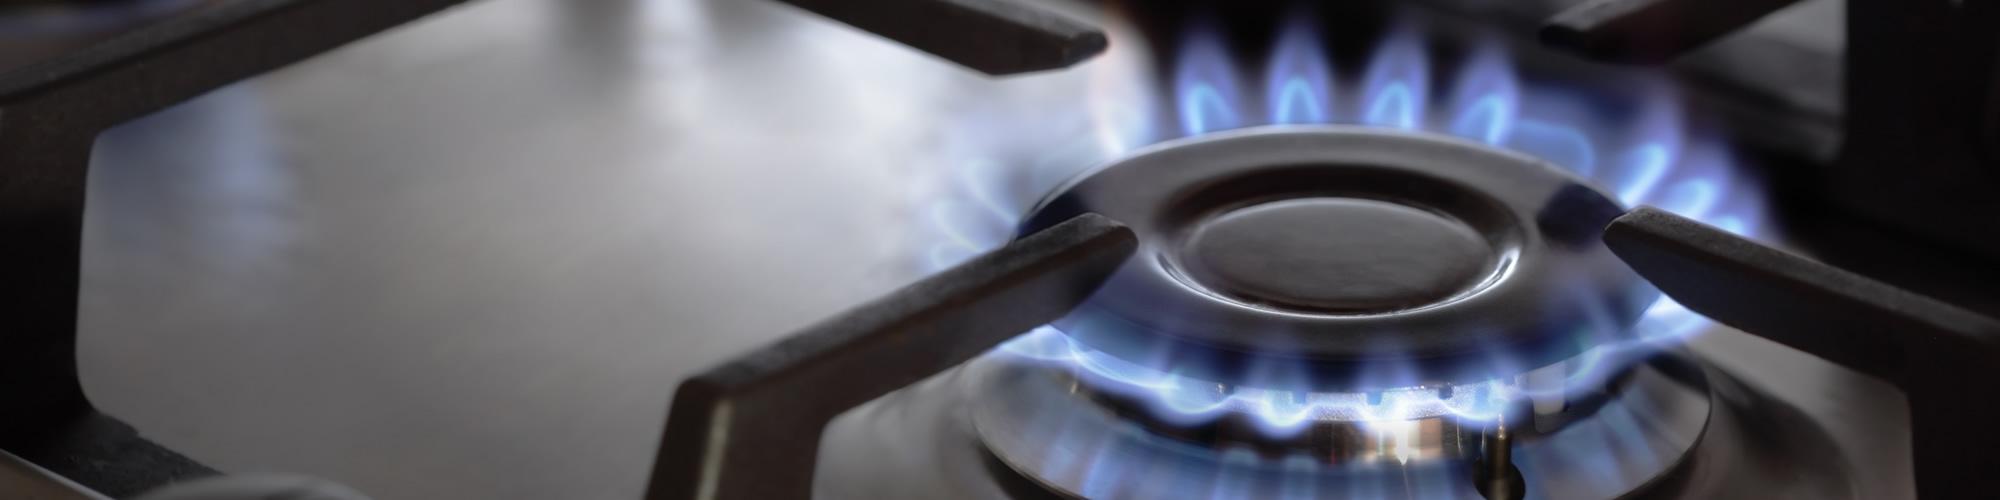 slide-gas